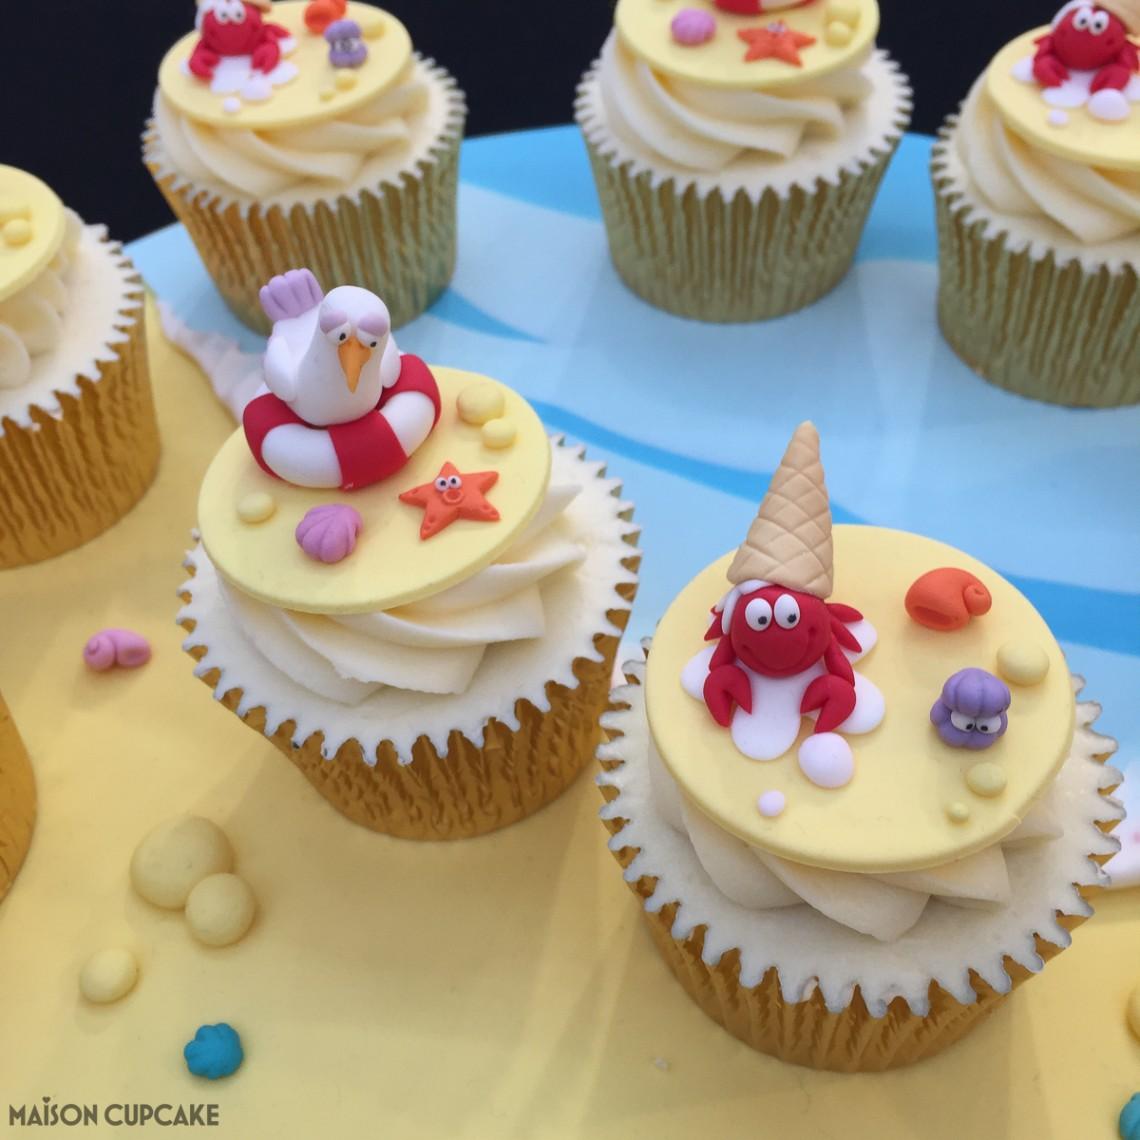 Seaside cupcakes